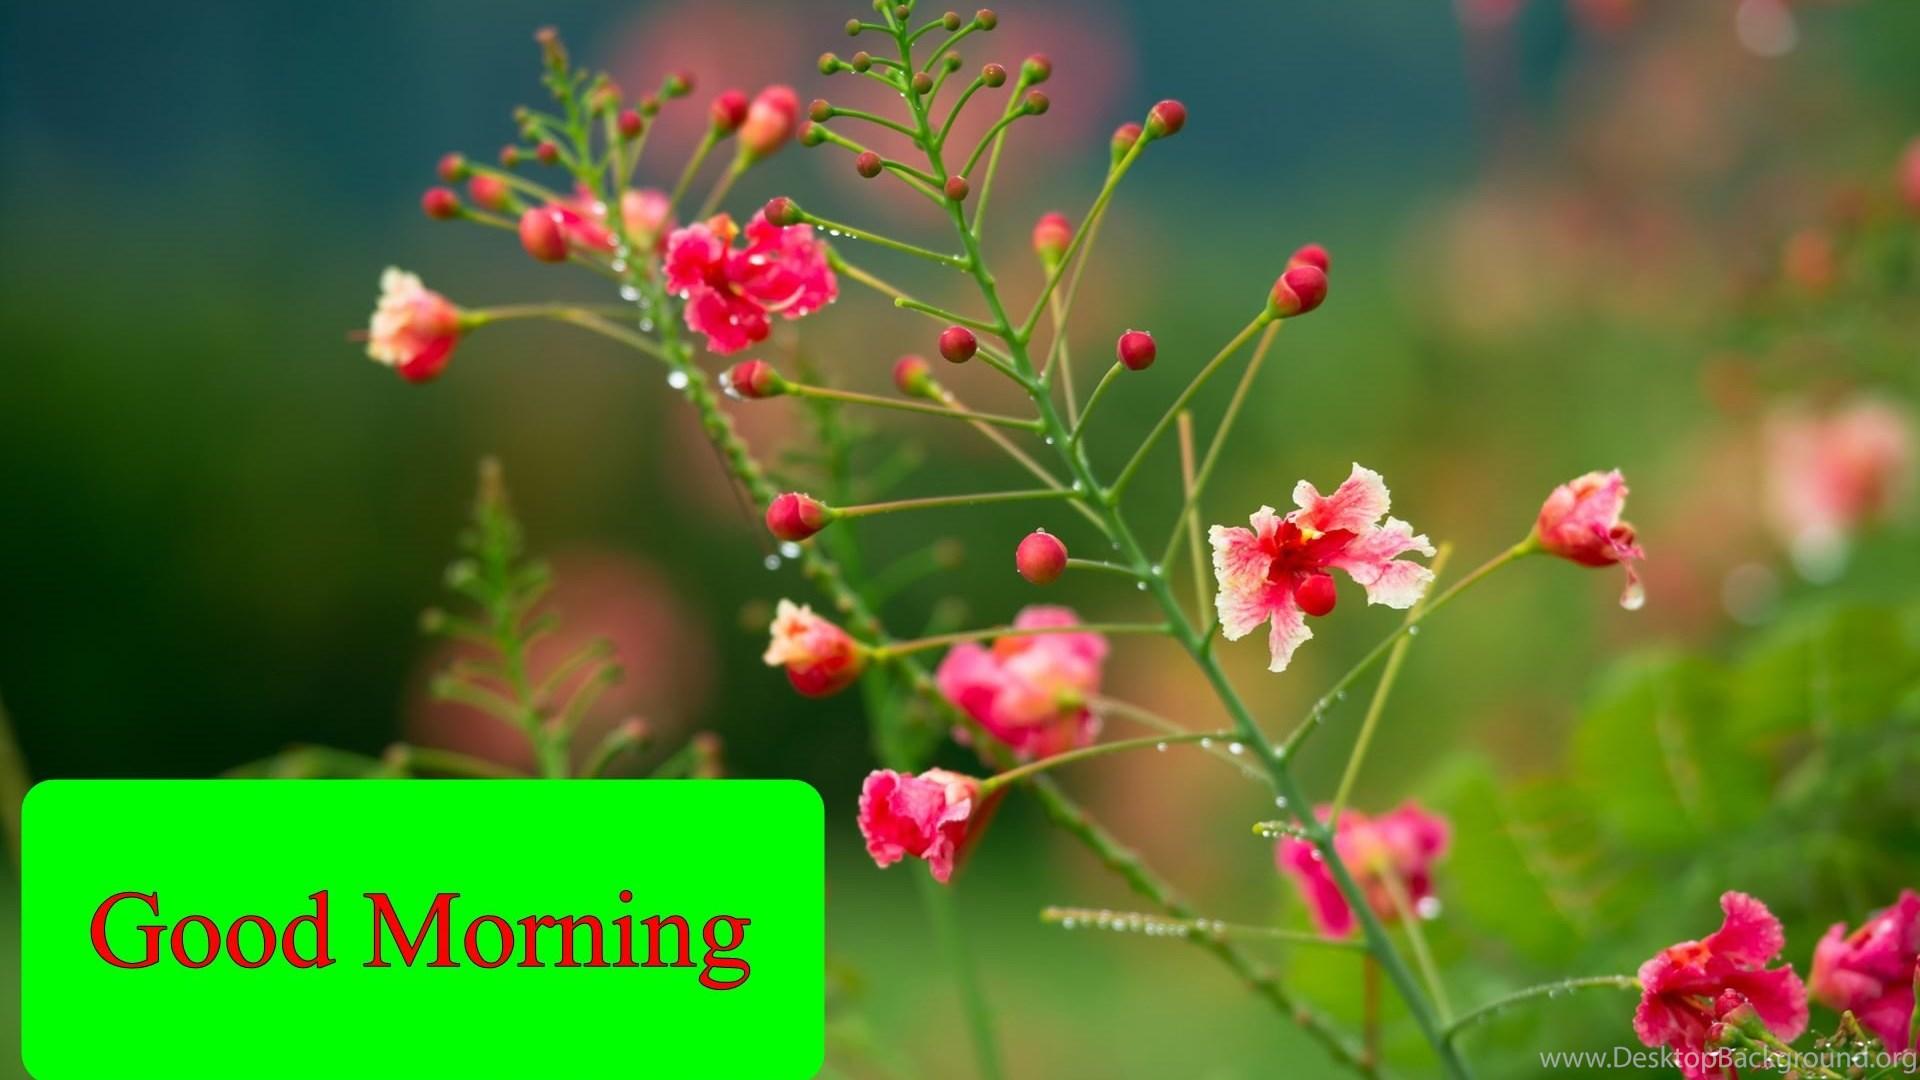 Good Morning Flower Hd Wallpapers Desktop Background